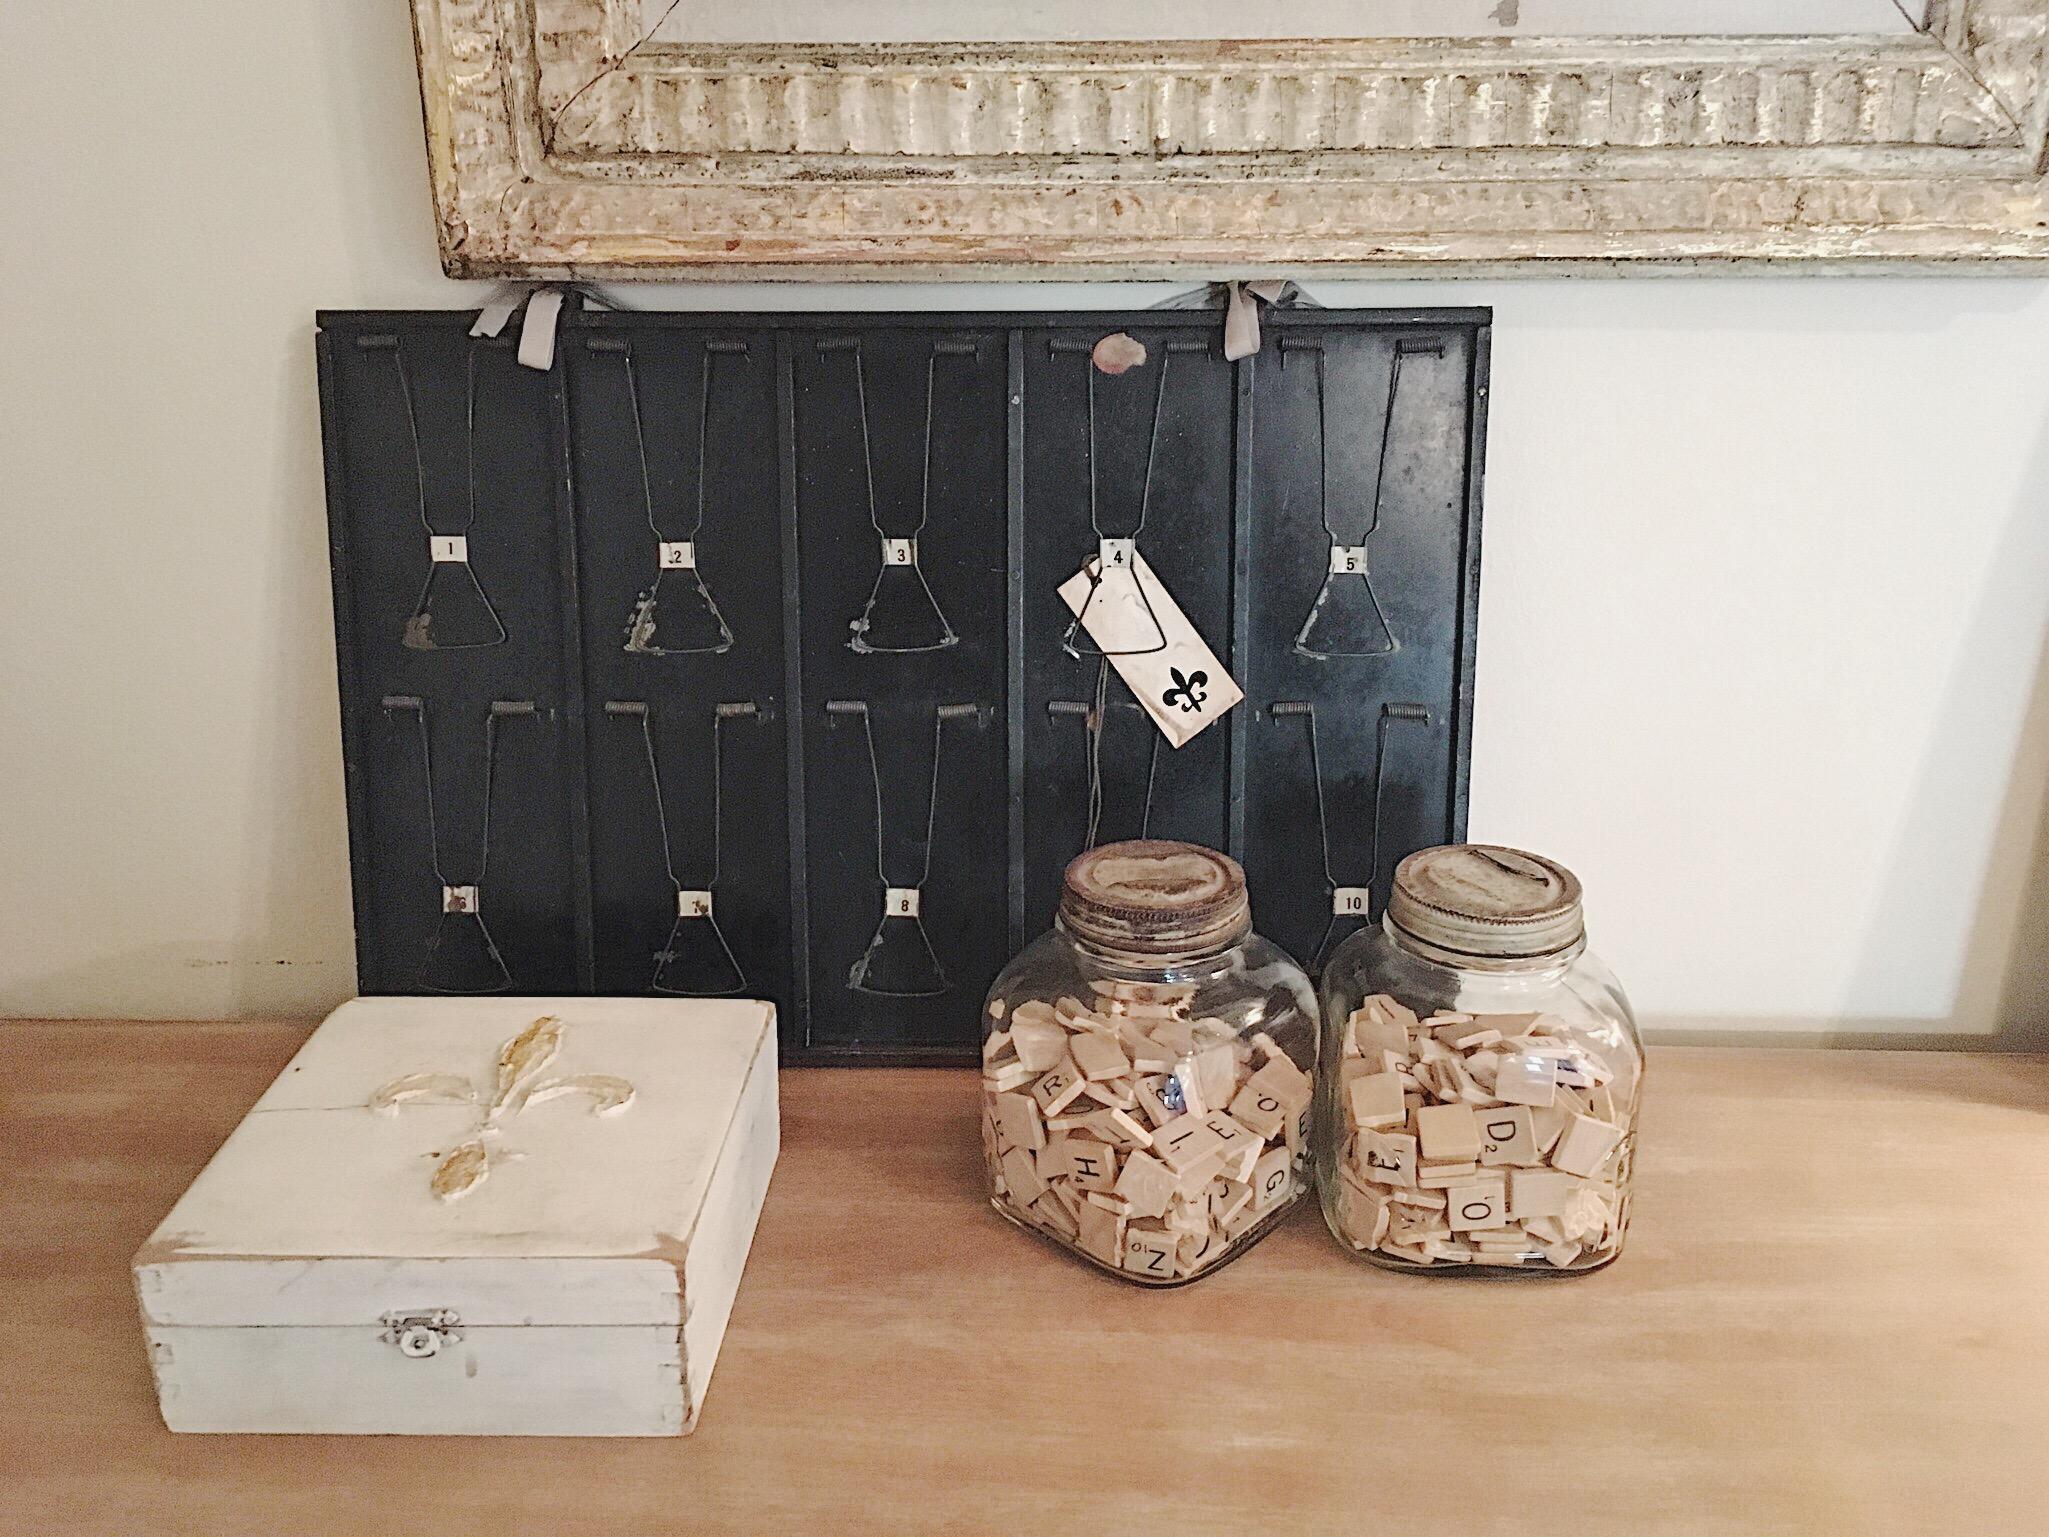 scrabble tiles in jar